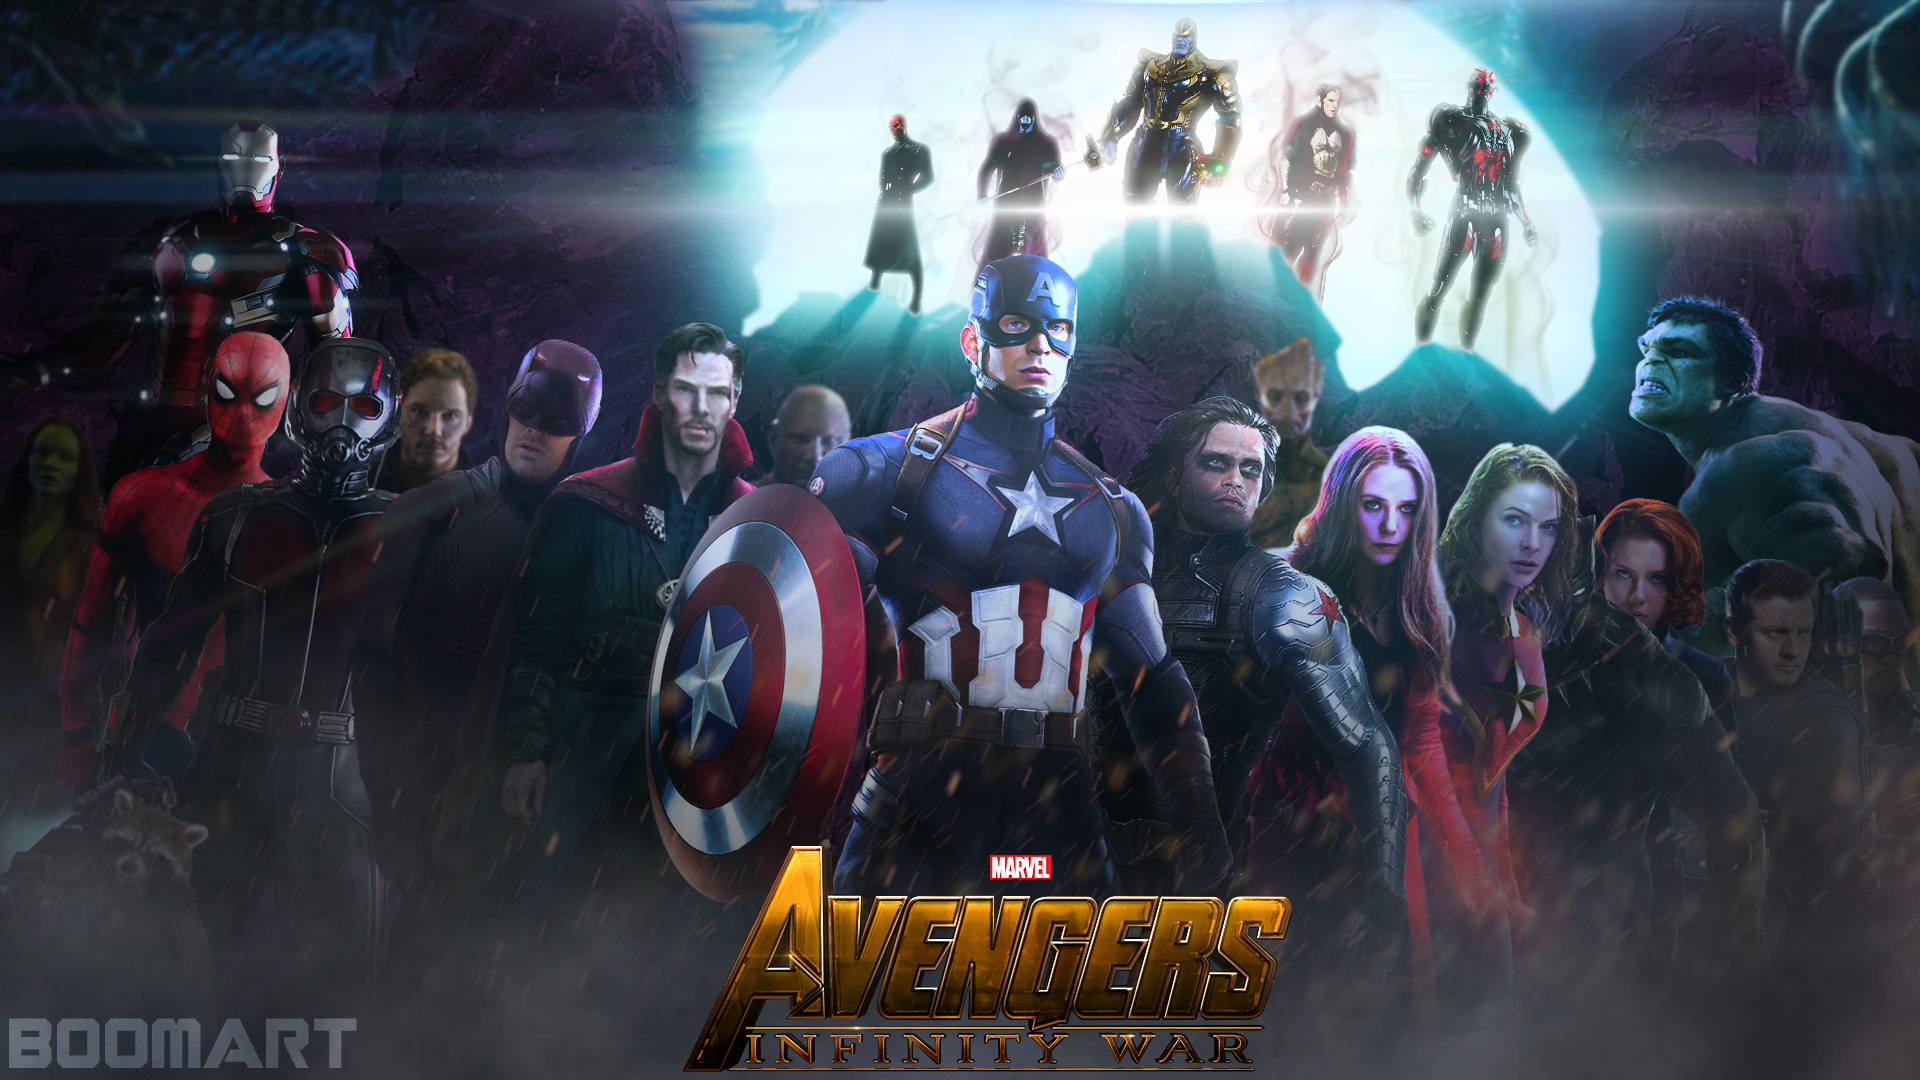 Avengers Infinity War Wallpaper By Boomart16 On Deviantart